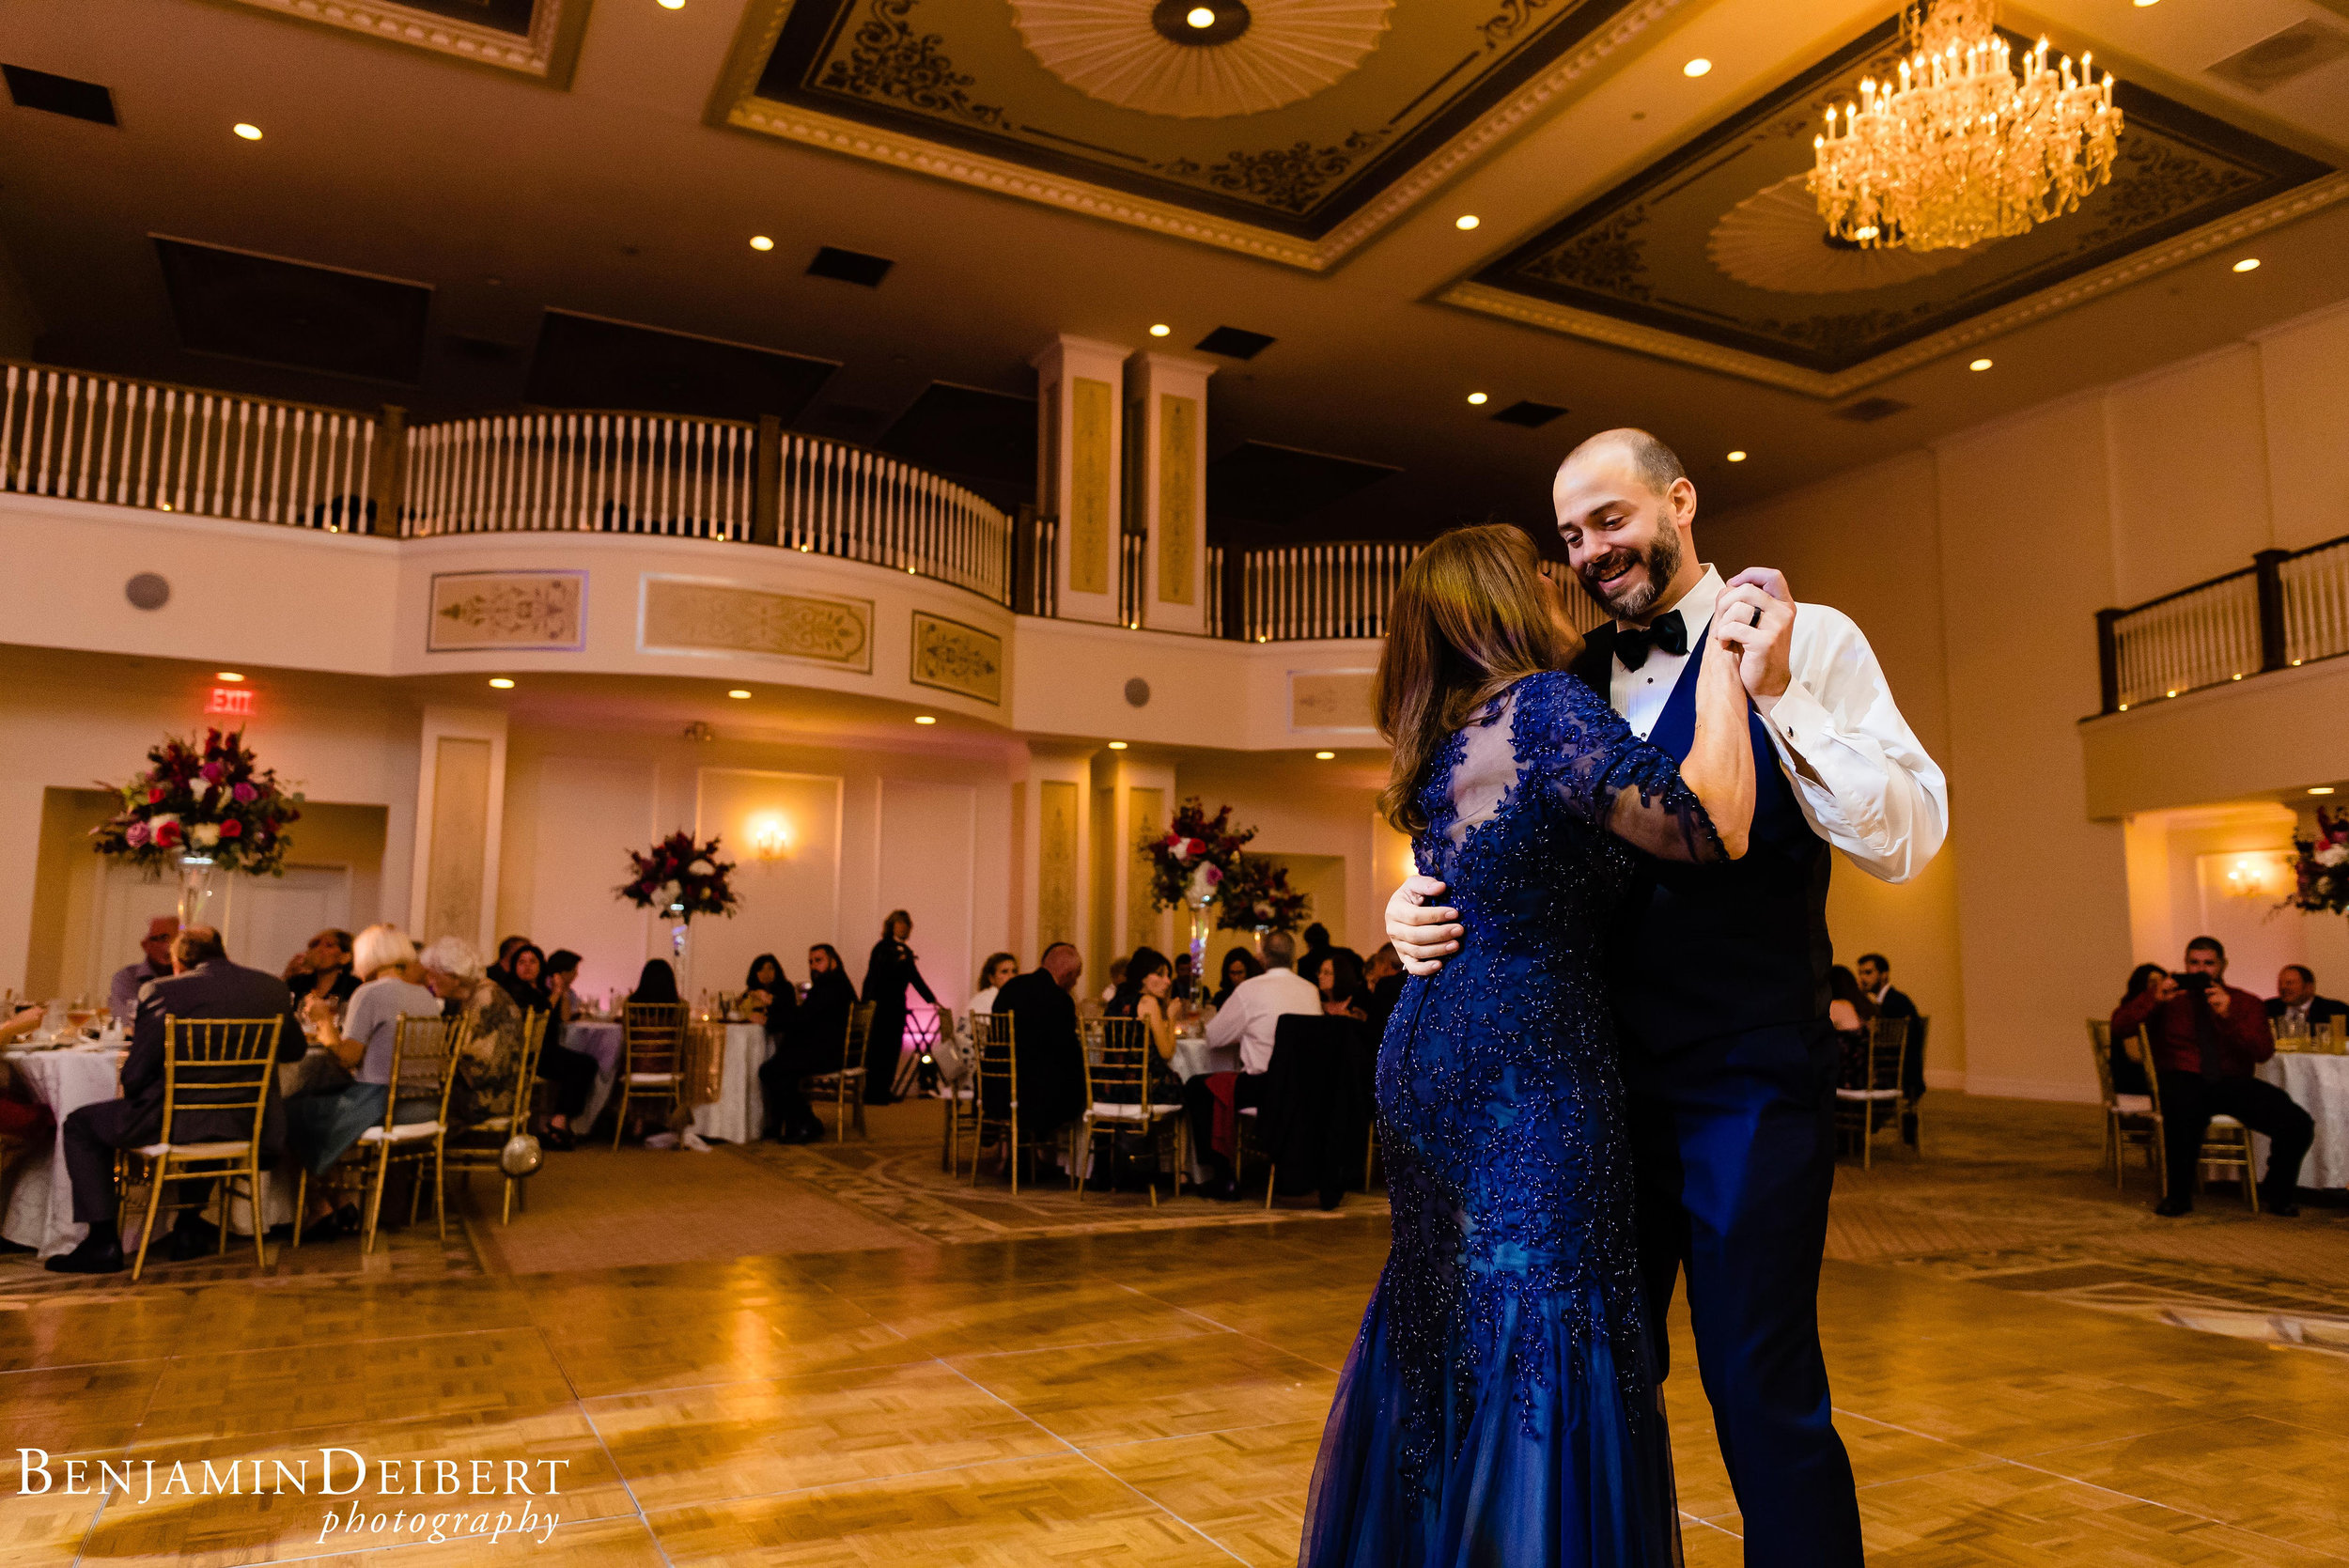 AmandaandElliott_TheCarriageHouse_Wedding-59.jpg